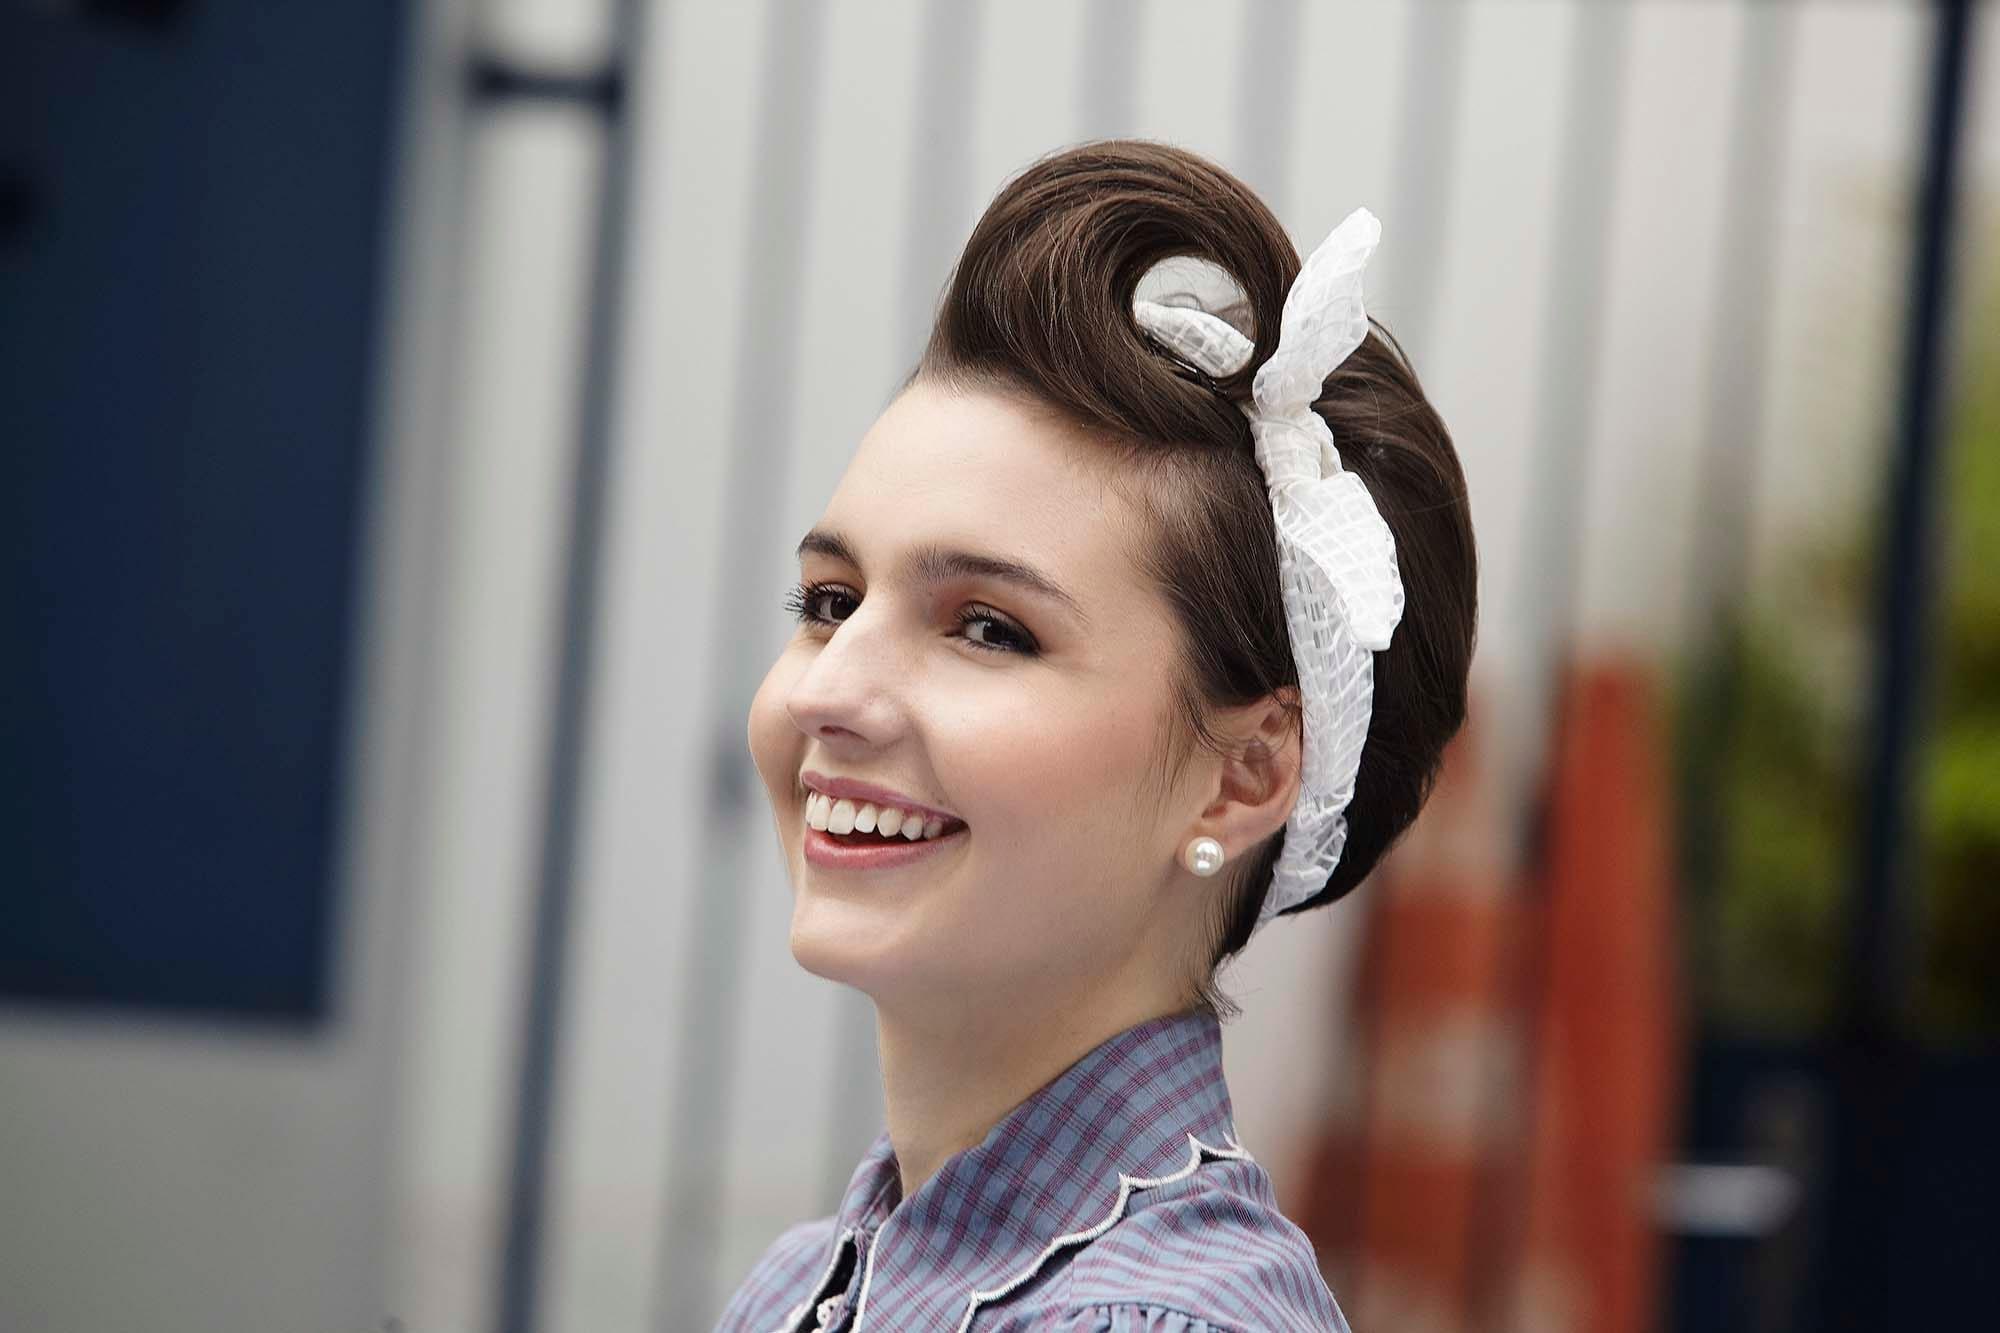 corte pixie con jopo años 60 con pañuelo